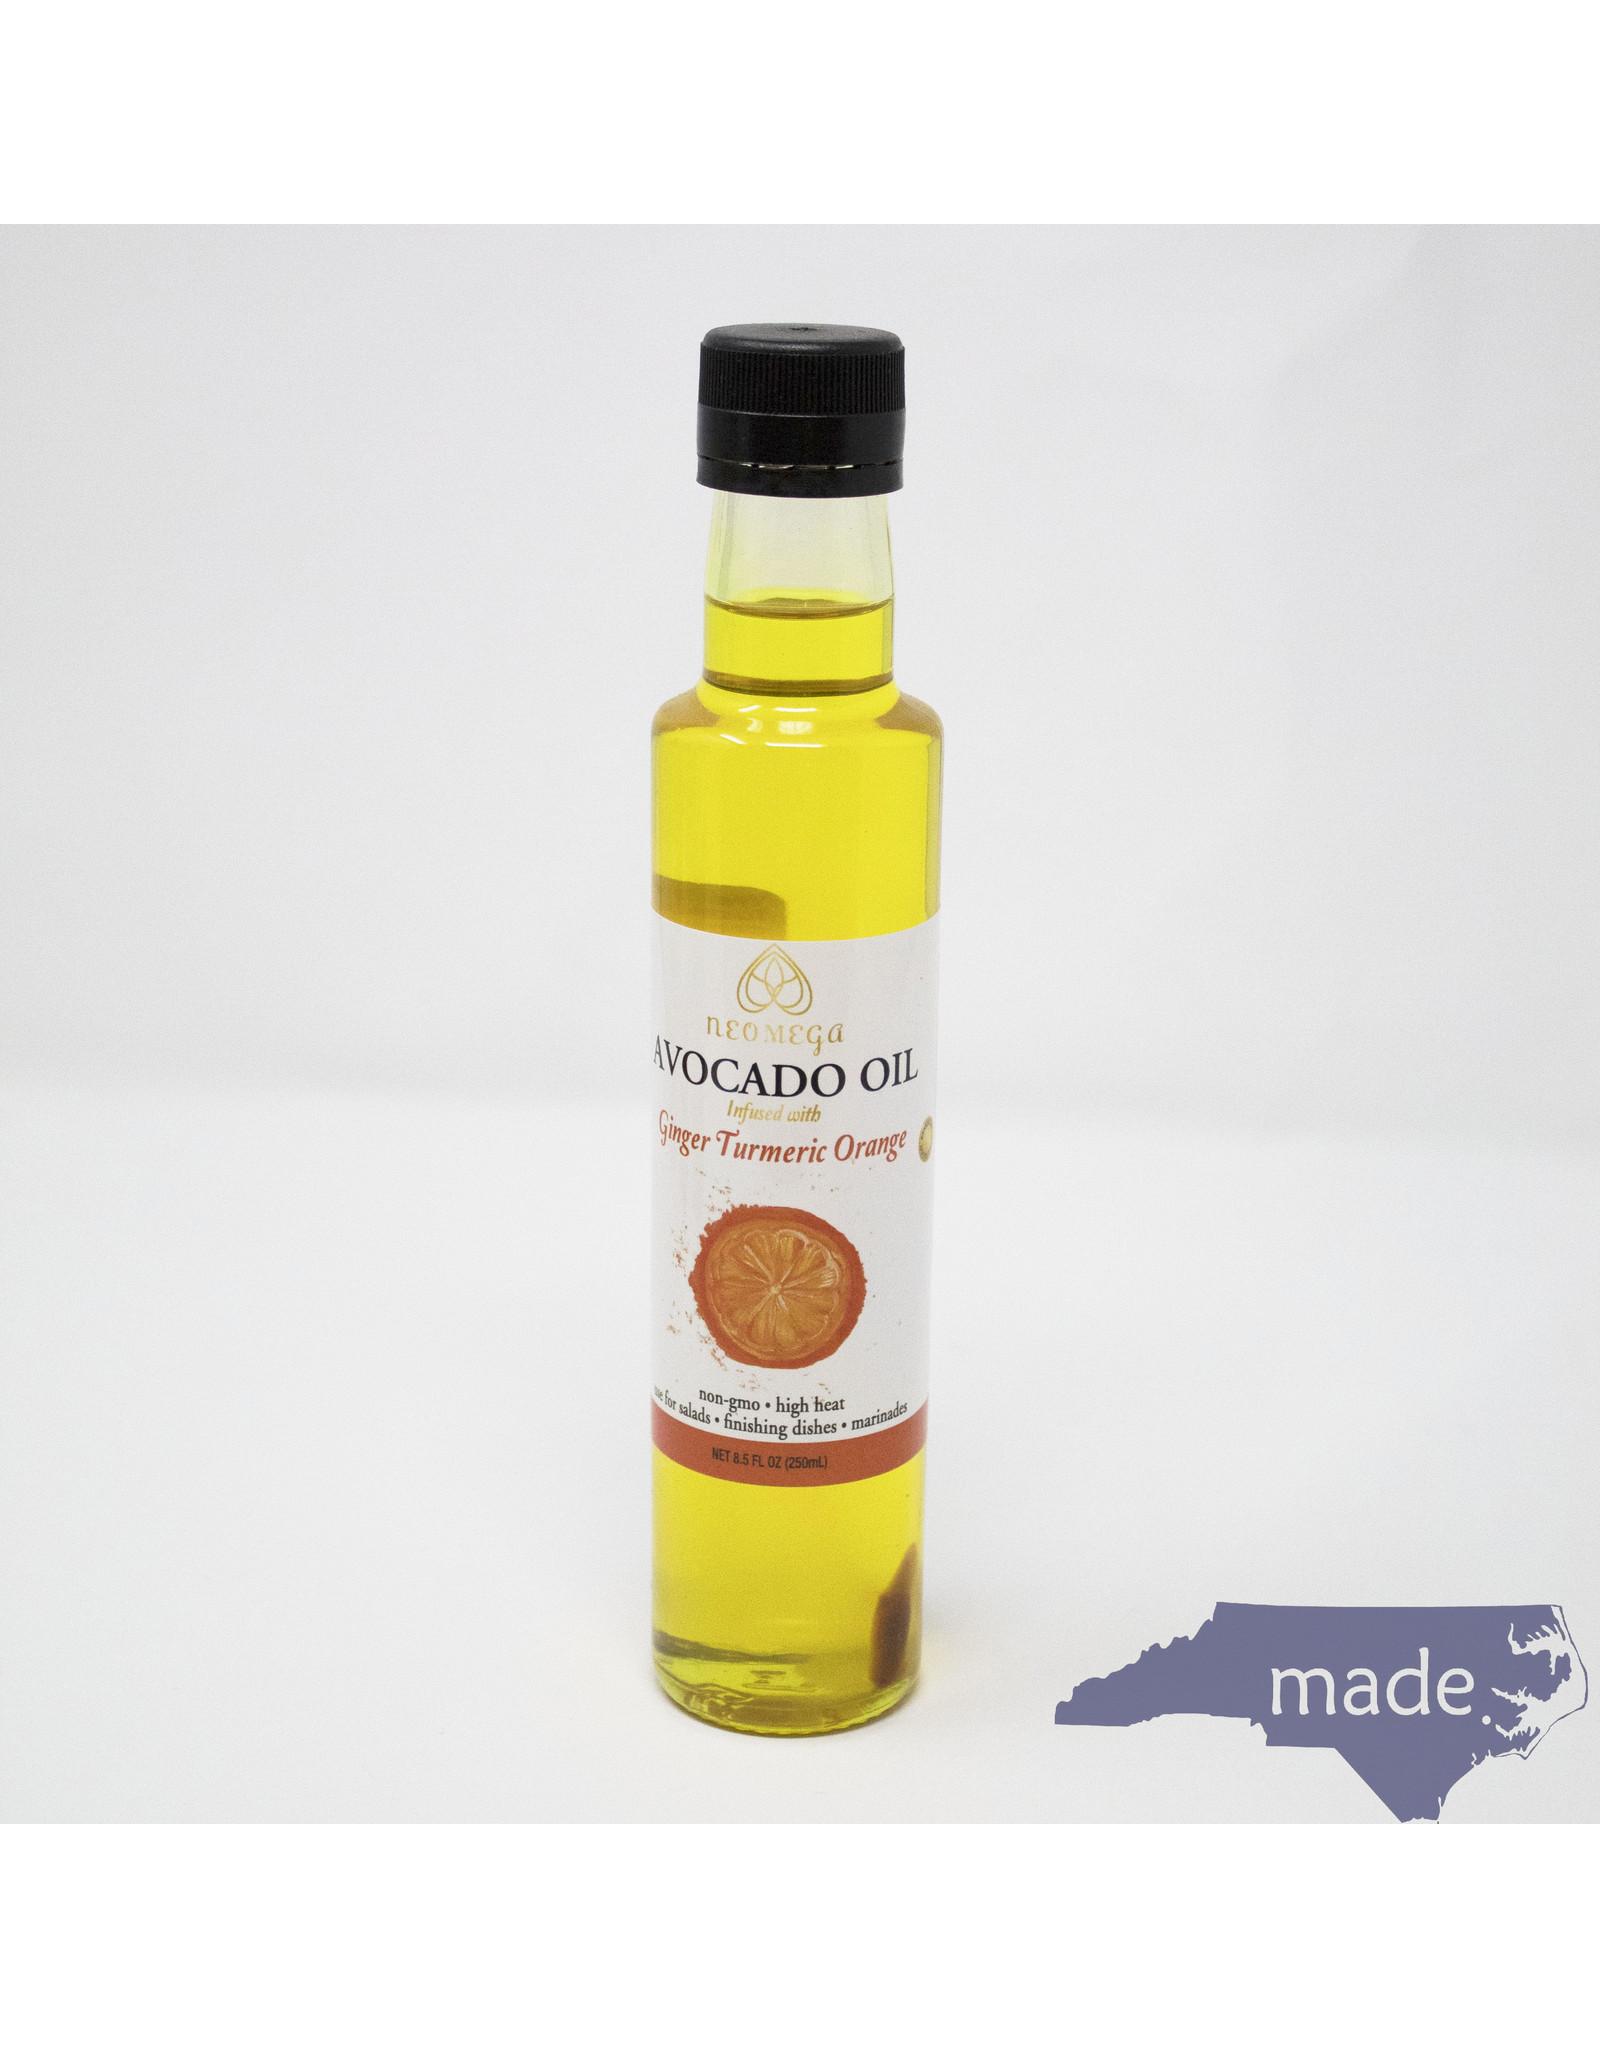 Neomega Ginger Turmeric Orange Avocado Oil 8.5 oz. - Neomega